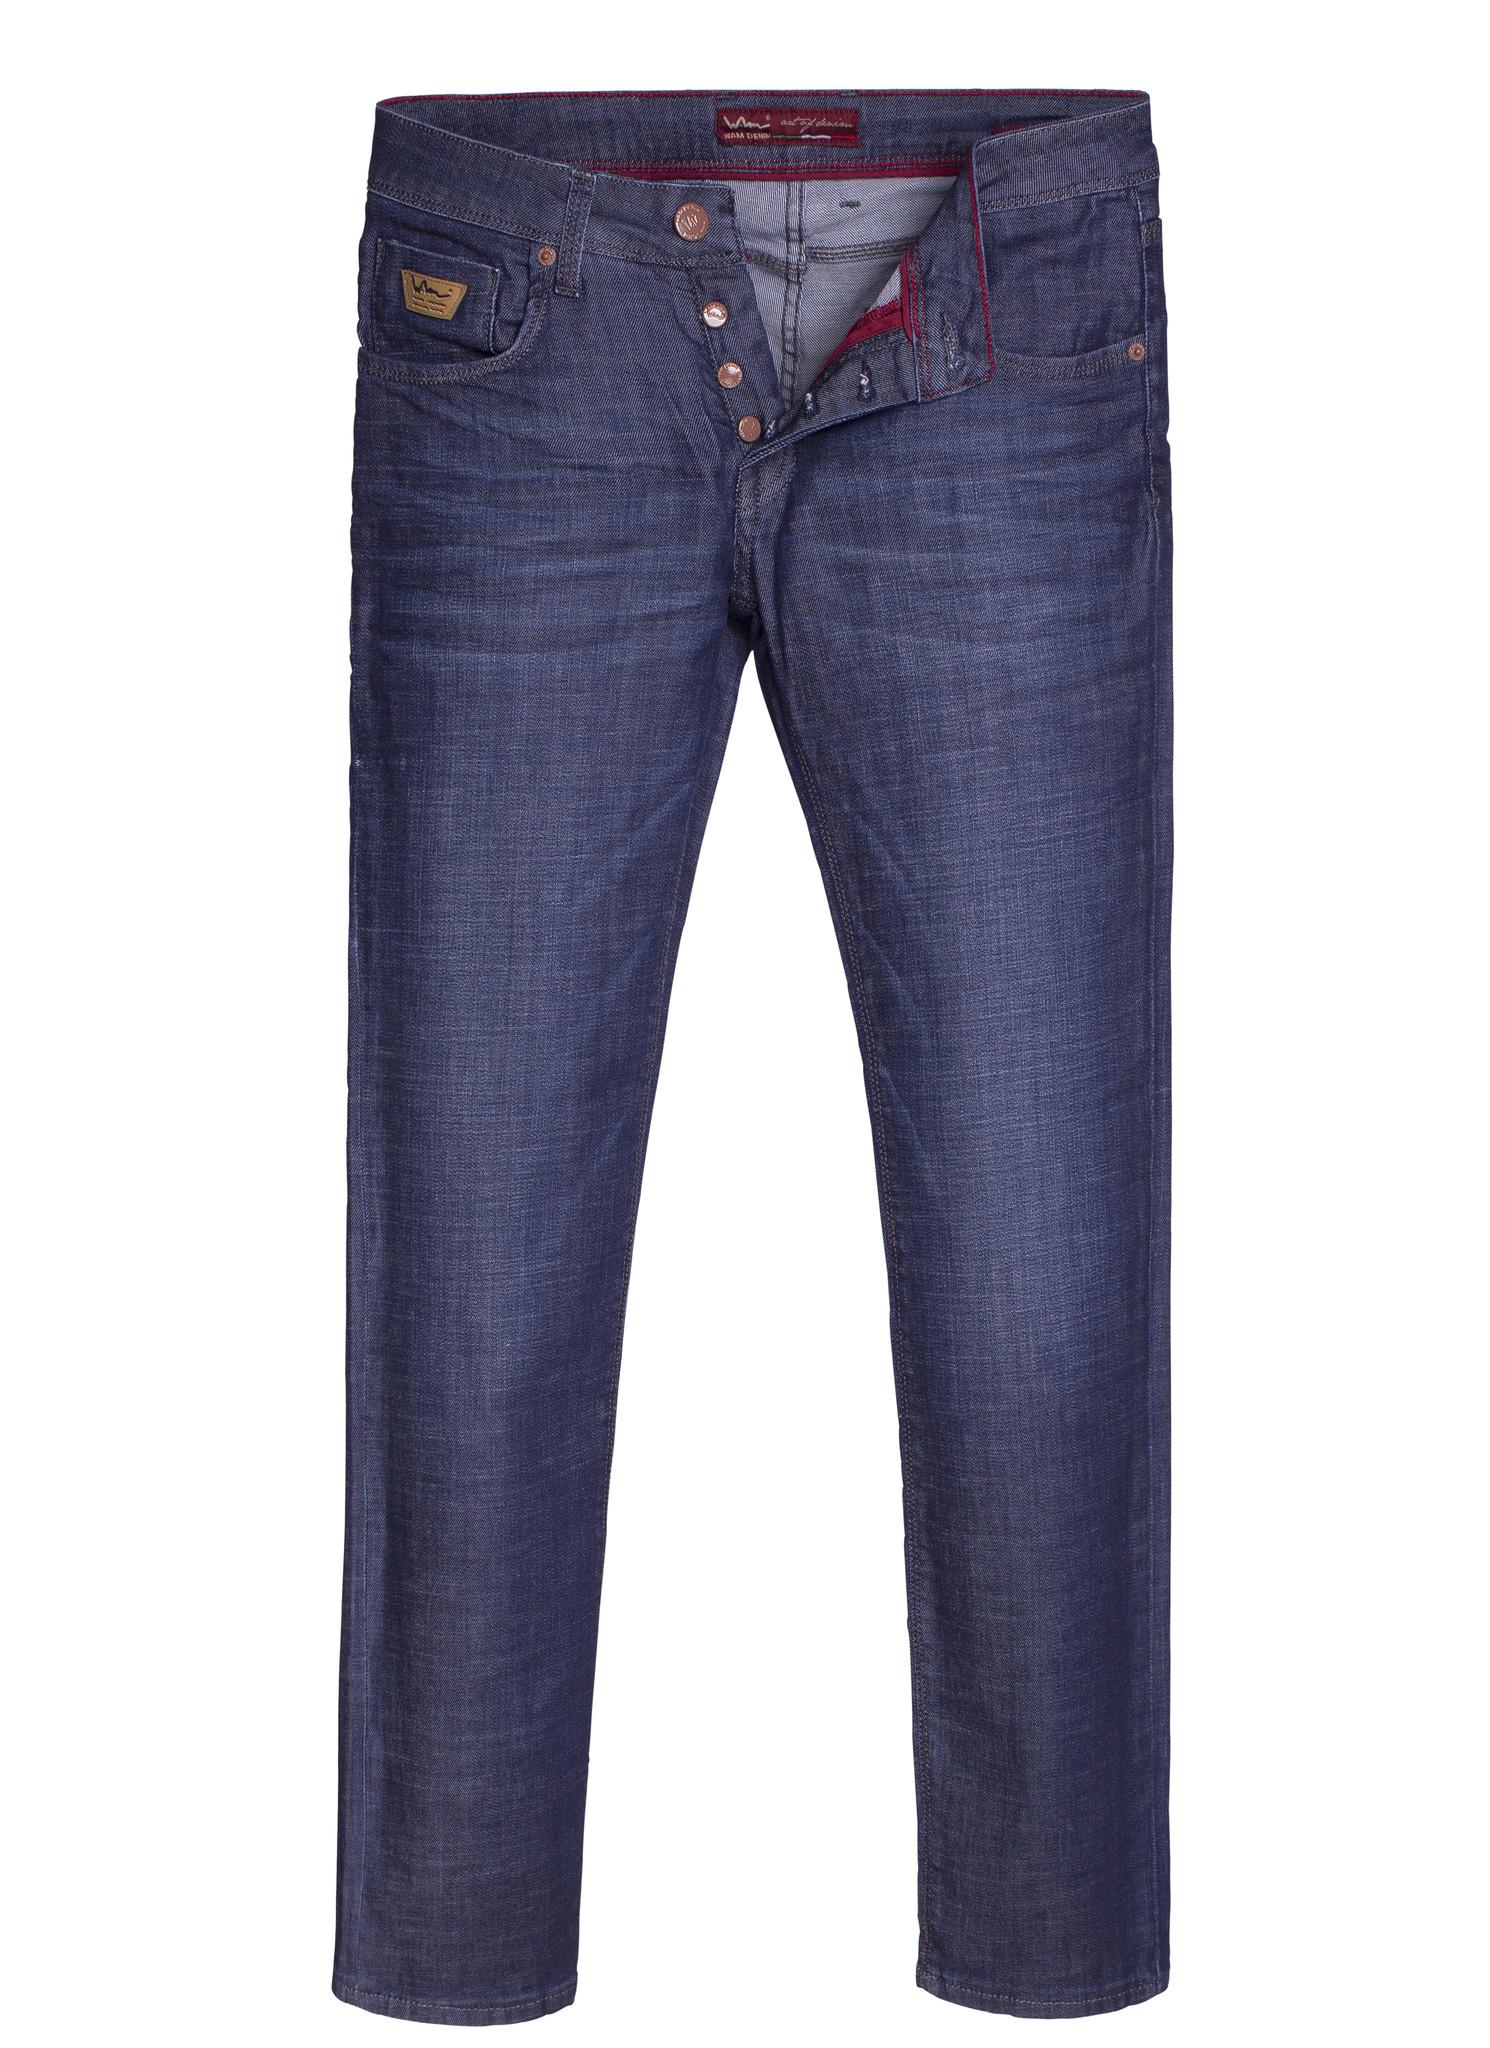 Wam Denim Jeans 92093